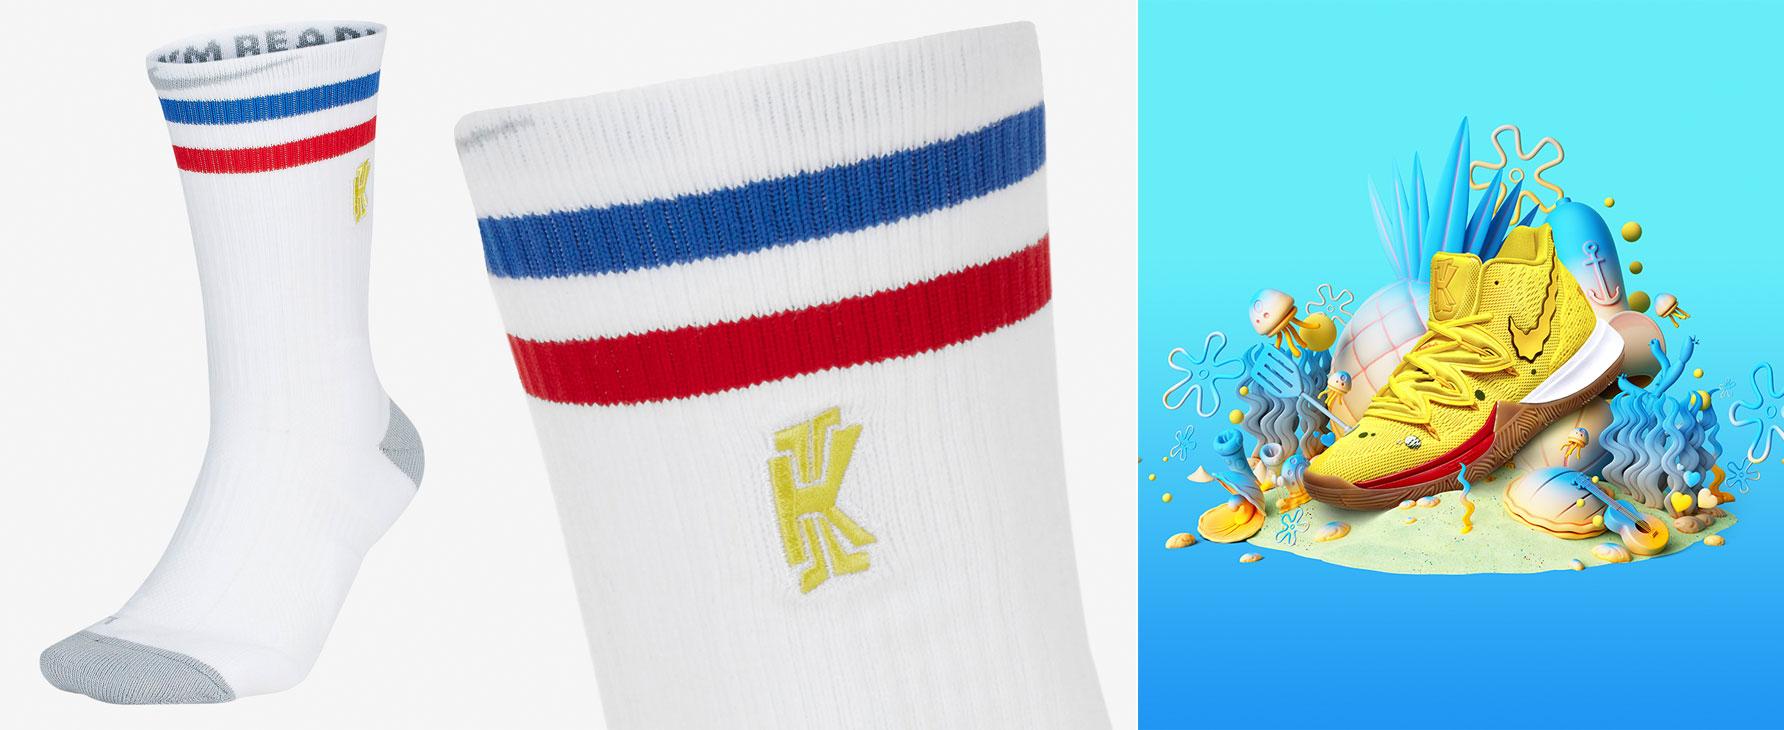 spongebob-nike-kyrie-socks